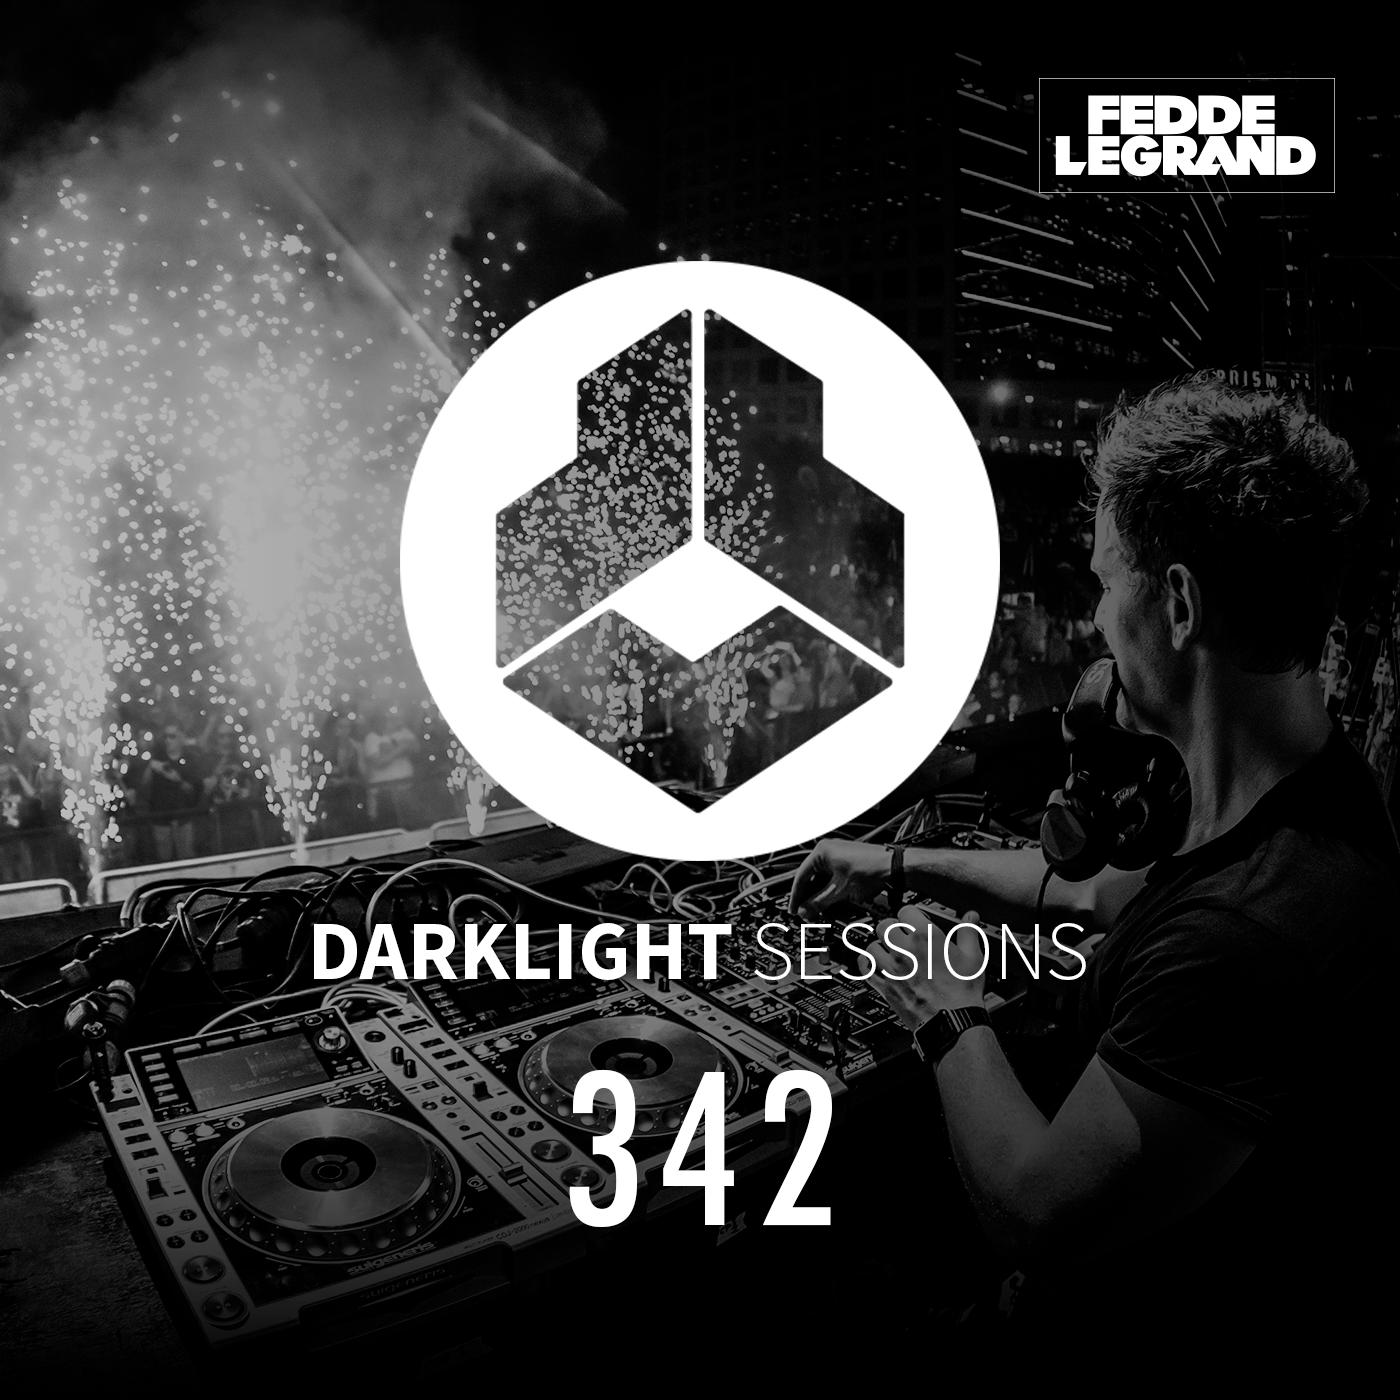 Darklight Sessions 342